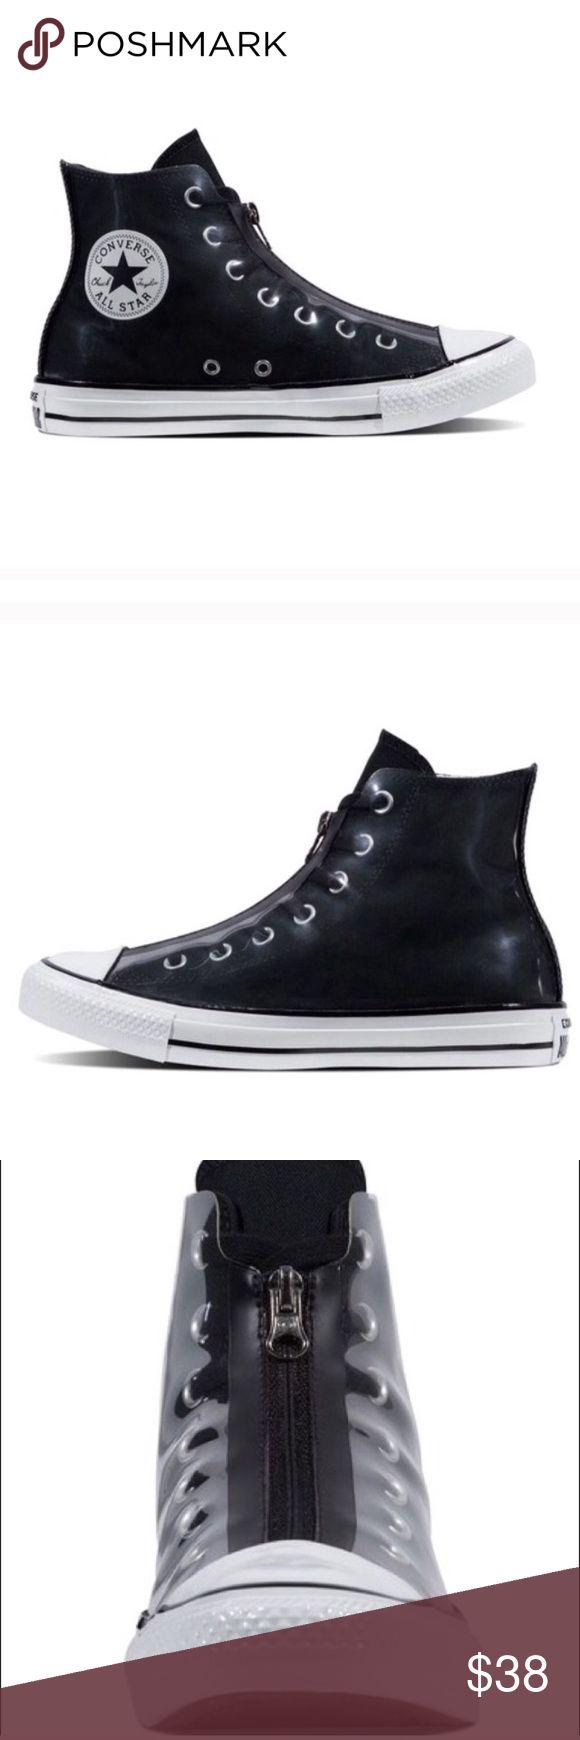 🎉FINAL SALE! CONVERSE WOMENS SHROUD SIZE 8 SHOES No box Converse Shoes Sneakers